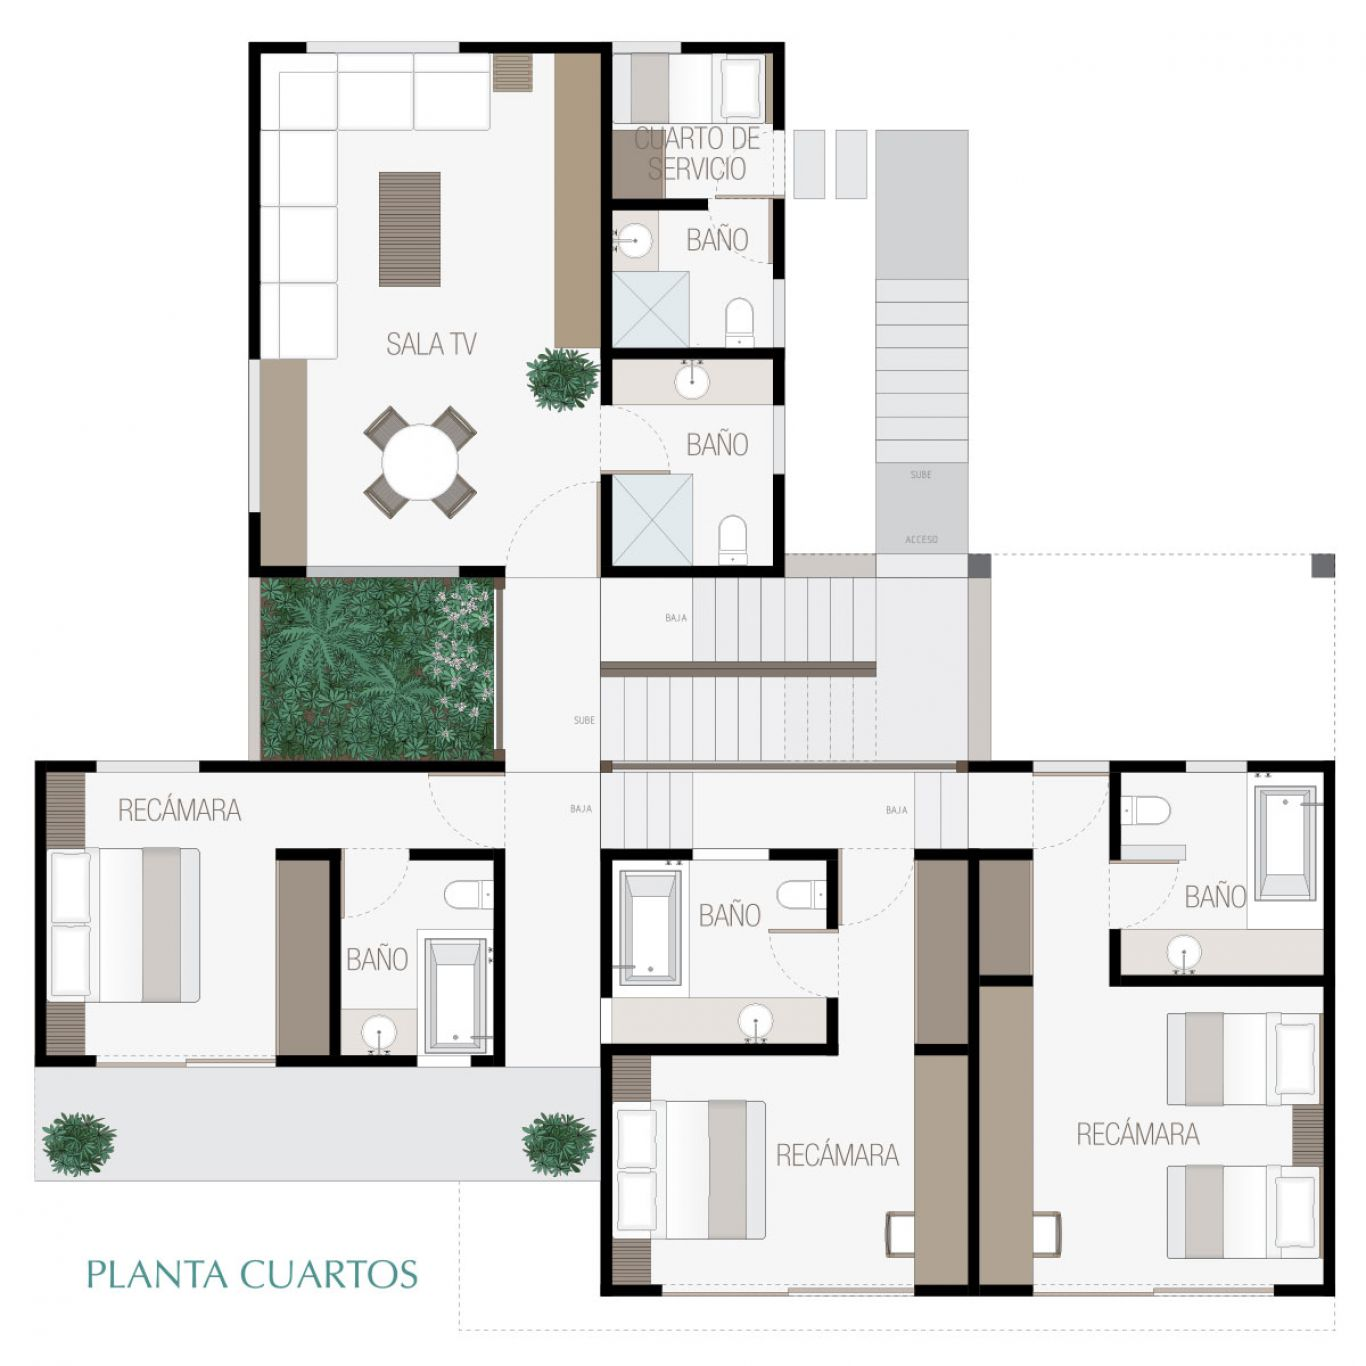 Manai, id 1519068, no 3, plano de villa 6, 292